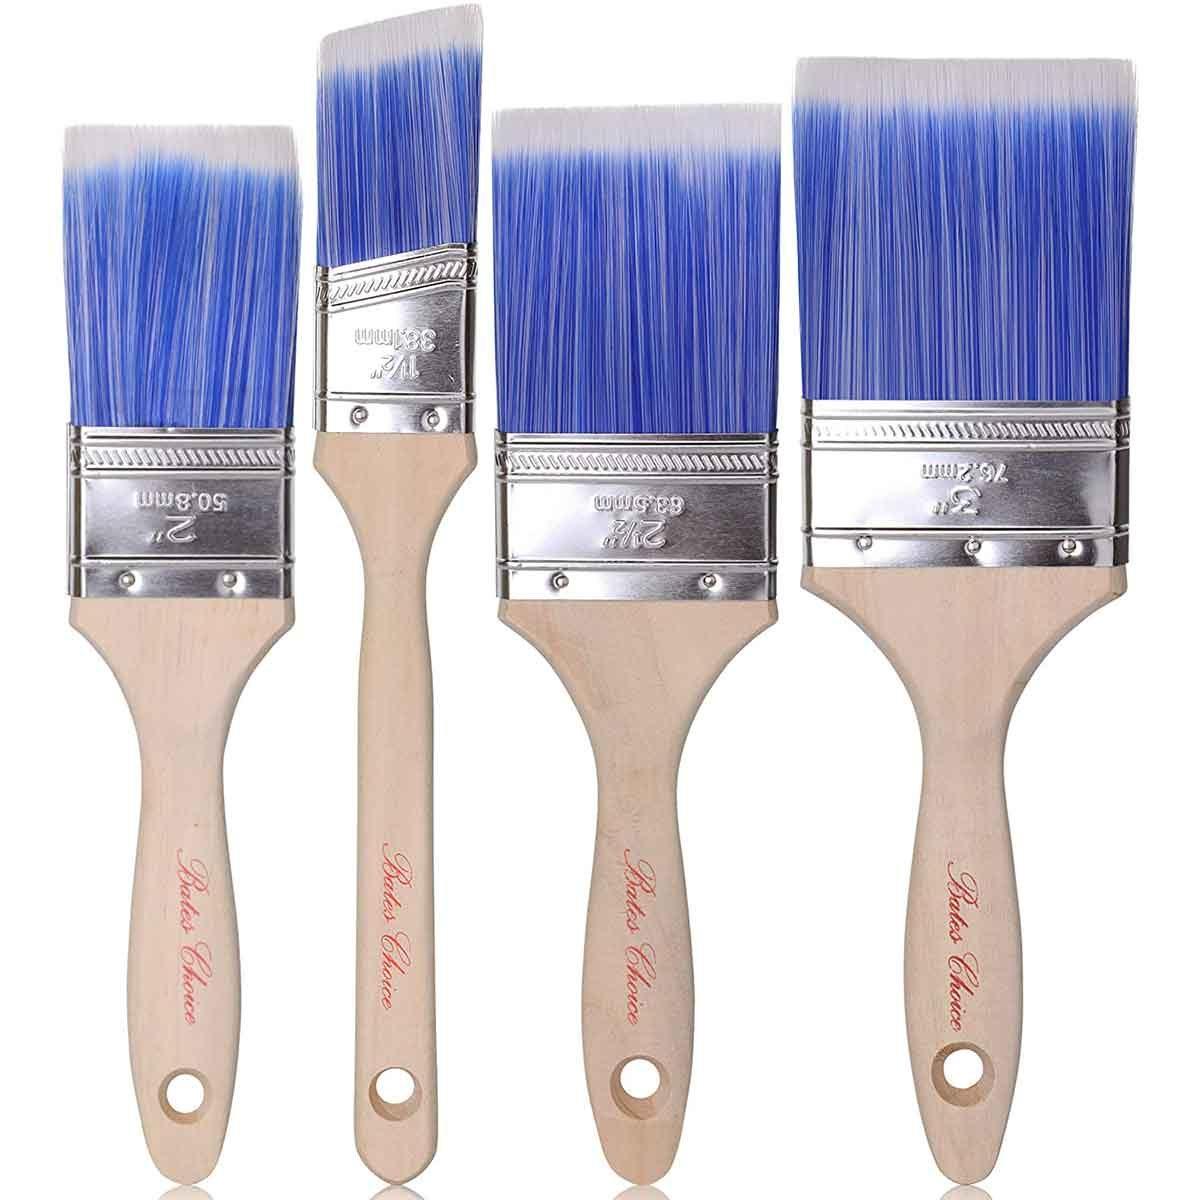 bates paint brush pack